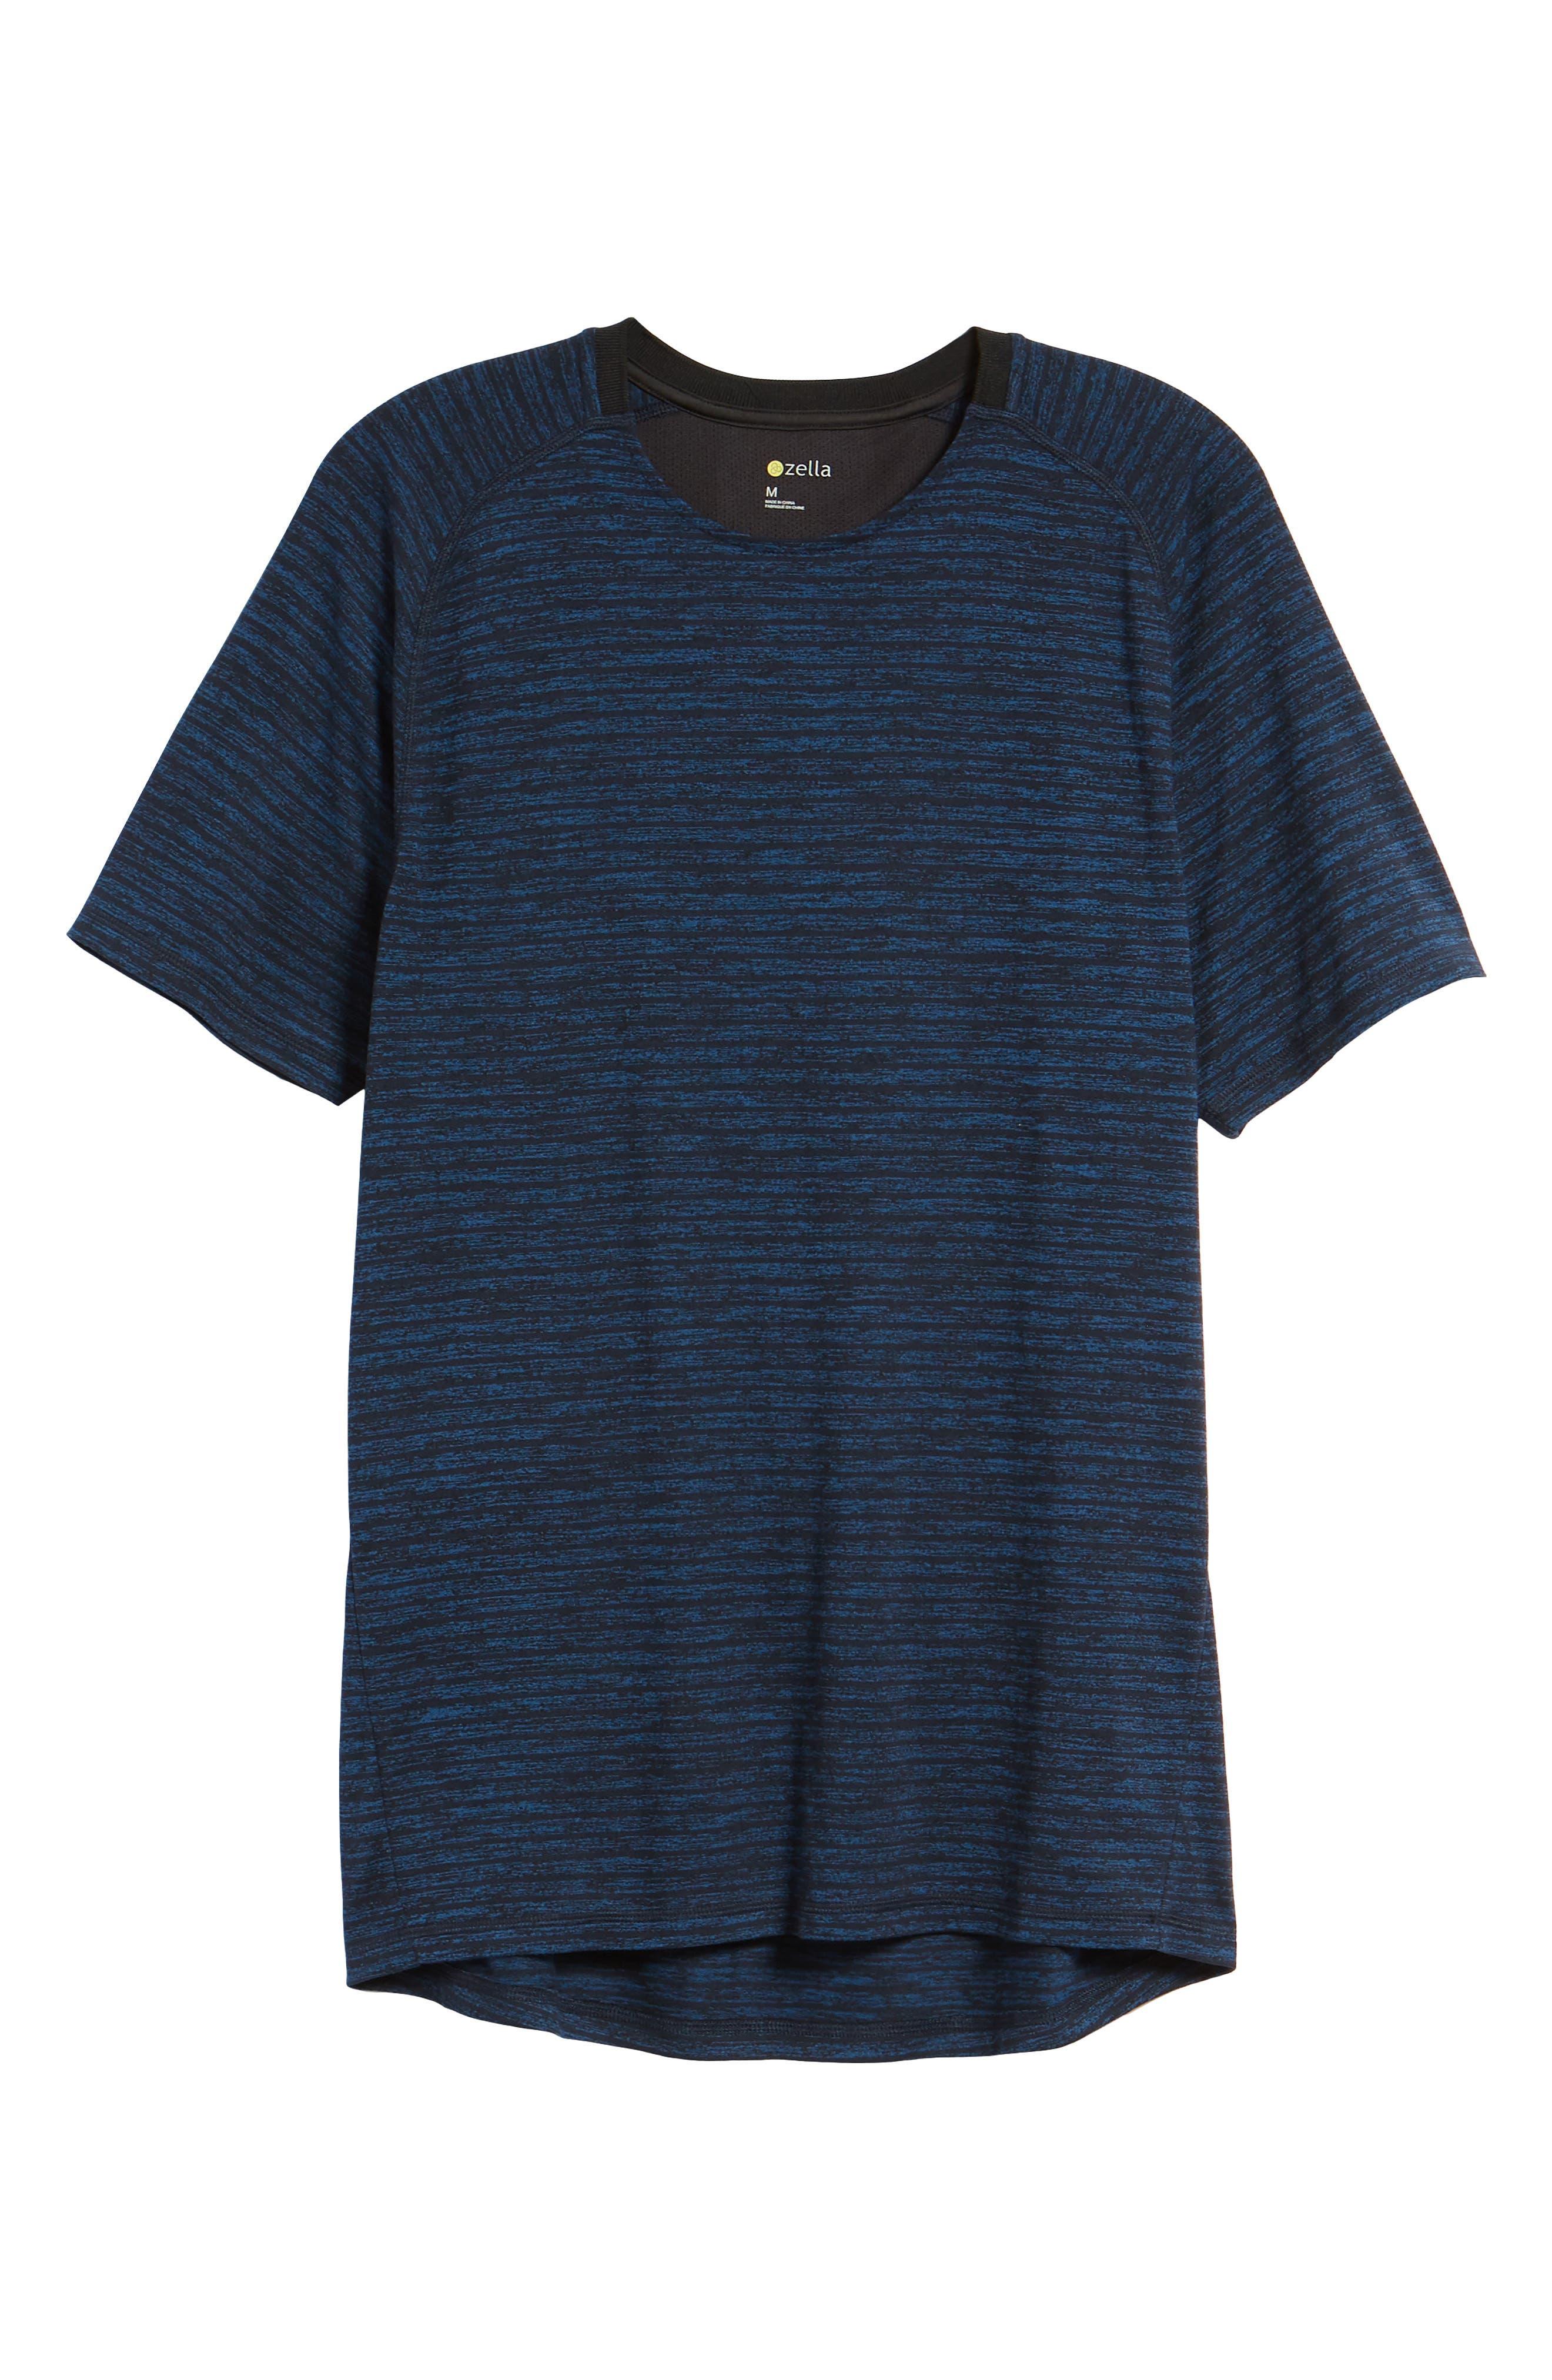 Stripe Crewneck T-Shirt,                             Alternate thumbnail 6, color,                             Blue Iolite Stripe